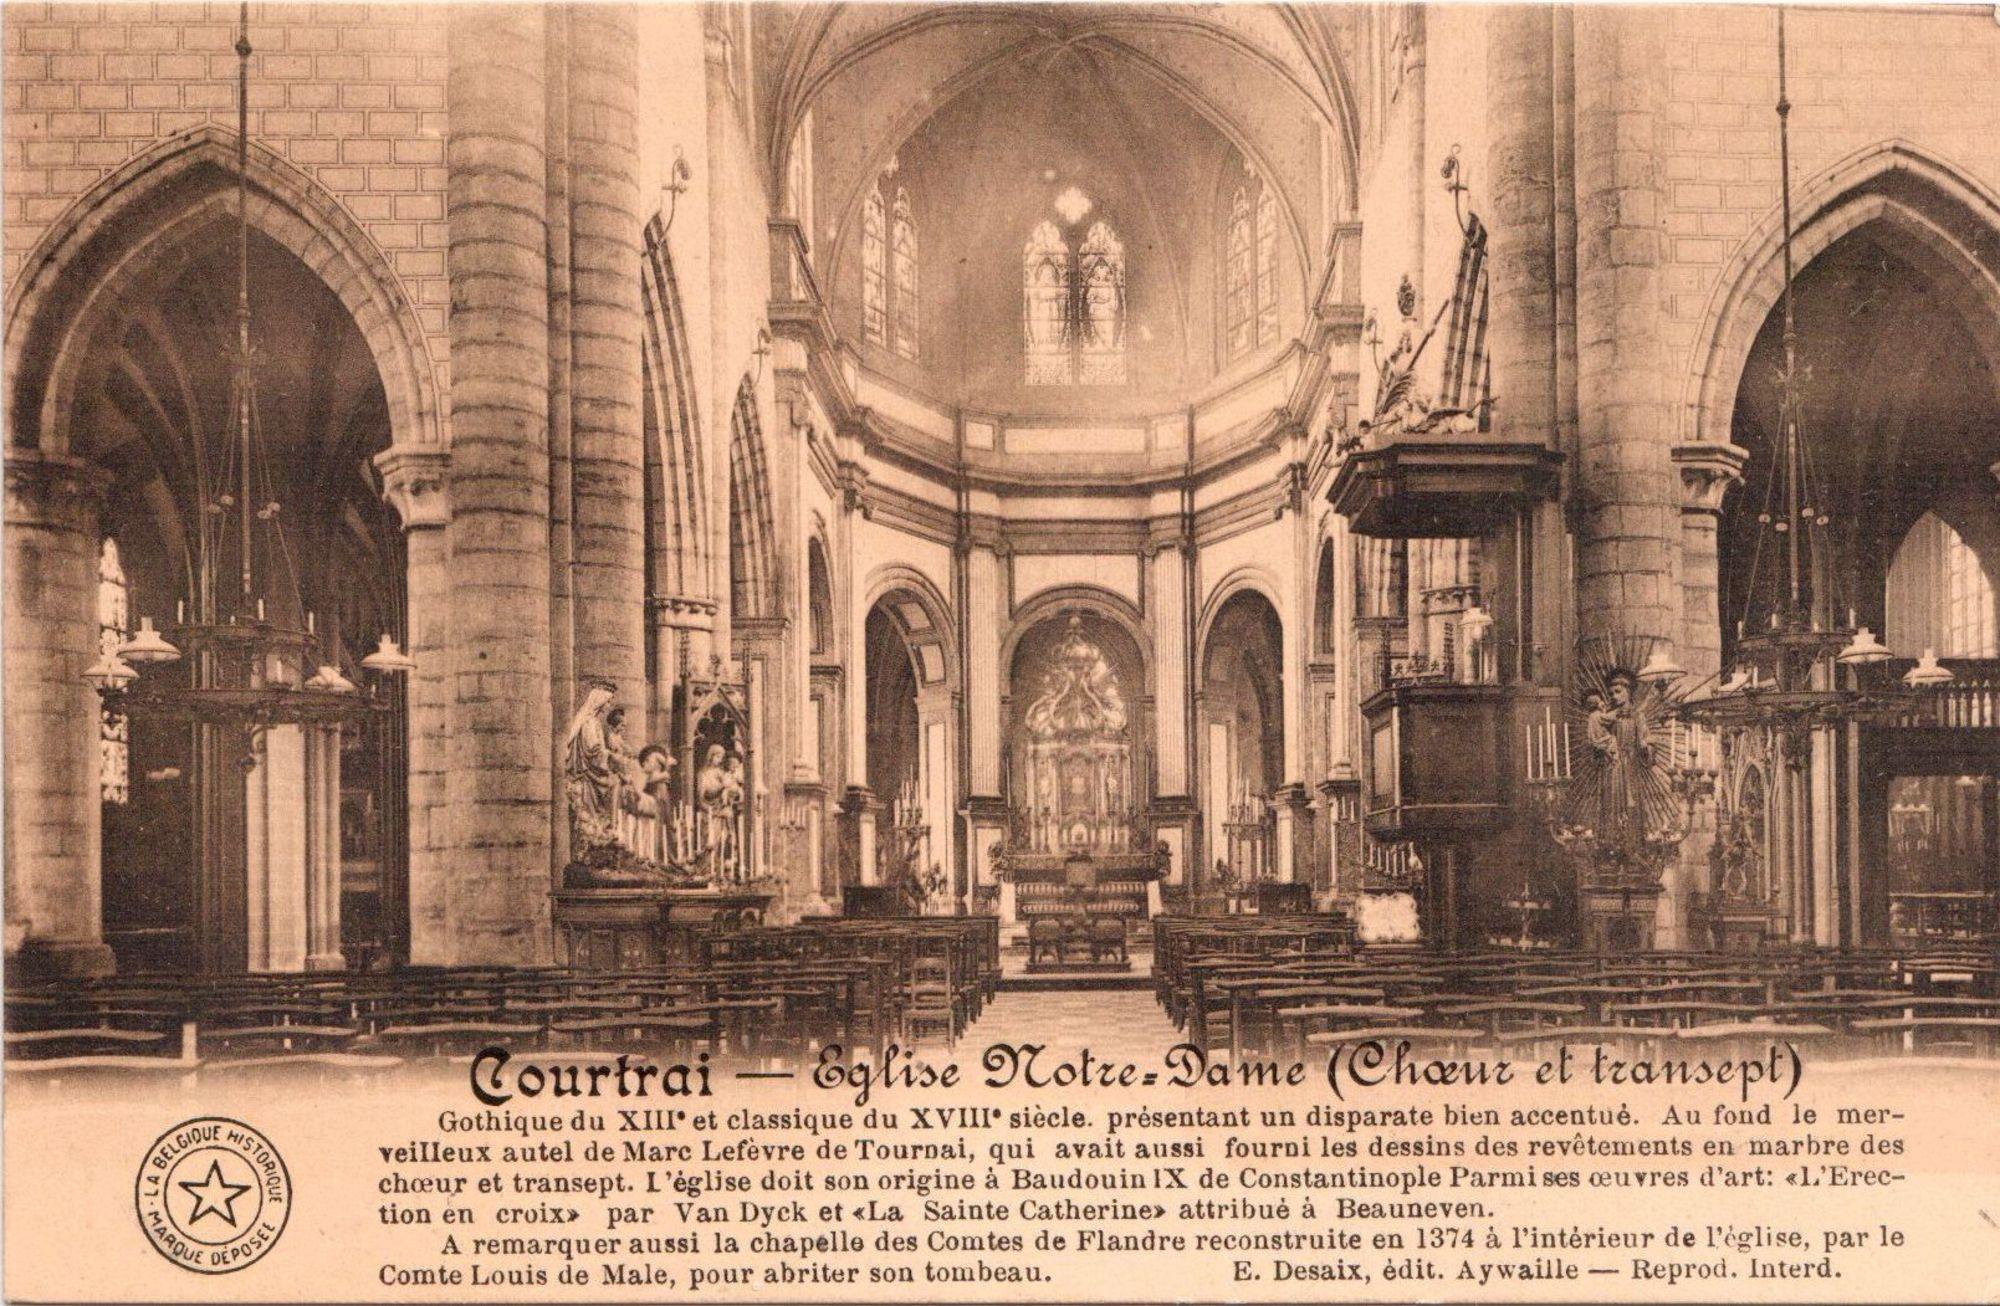 Interieur Onze-Lieve-Vrouwekerk